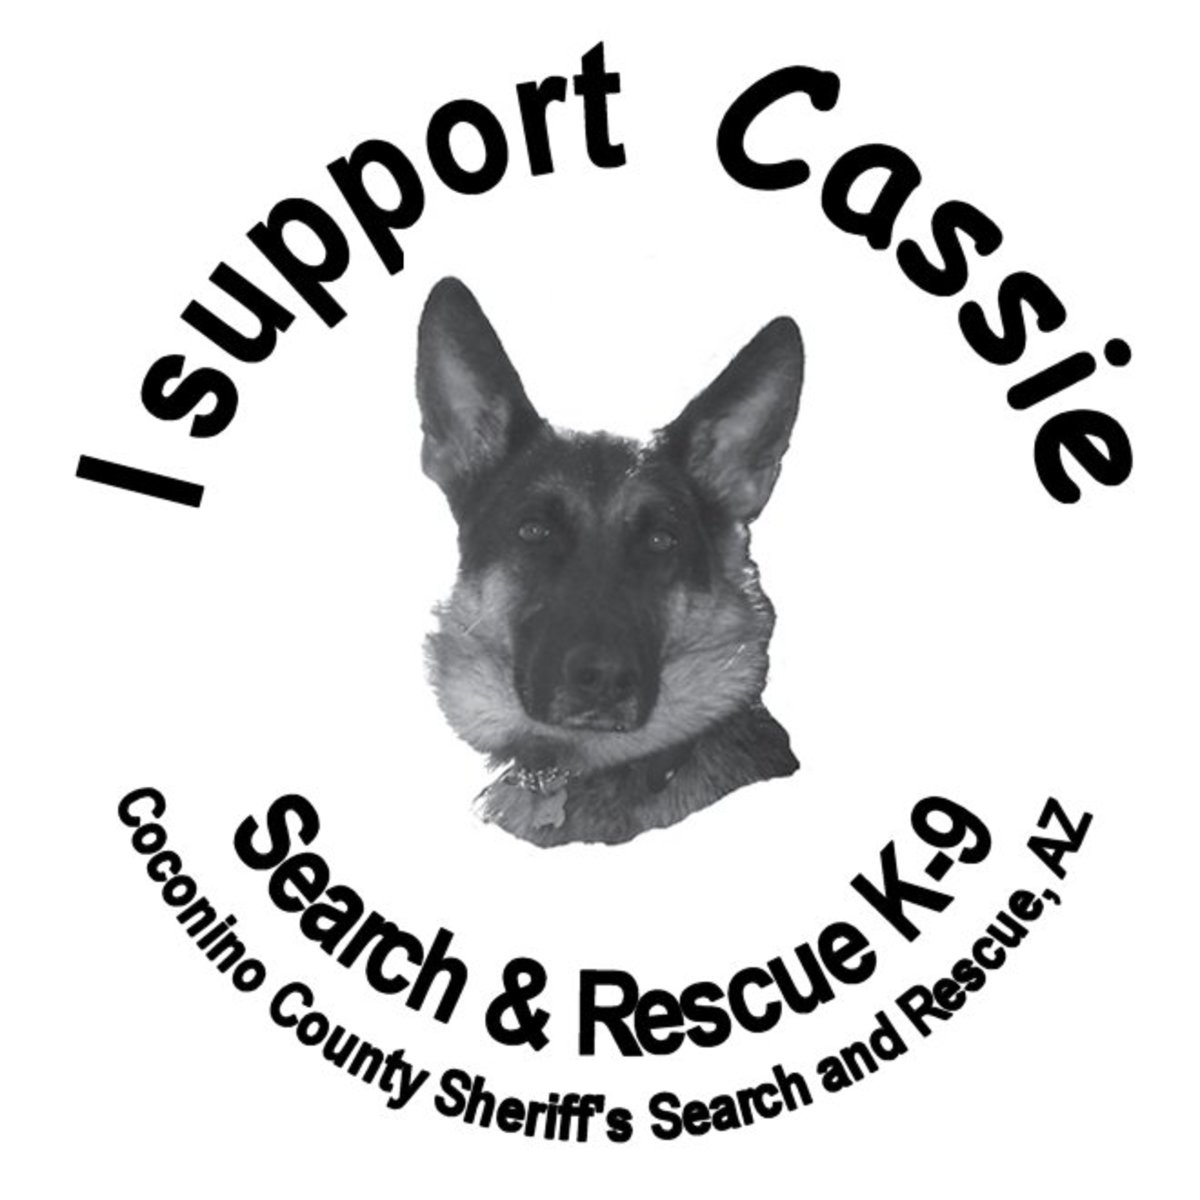 Coconino County Search and Rescue